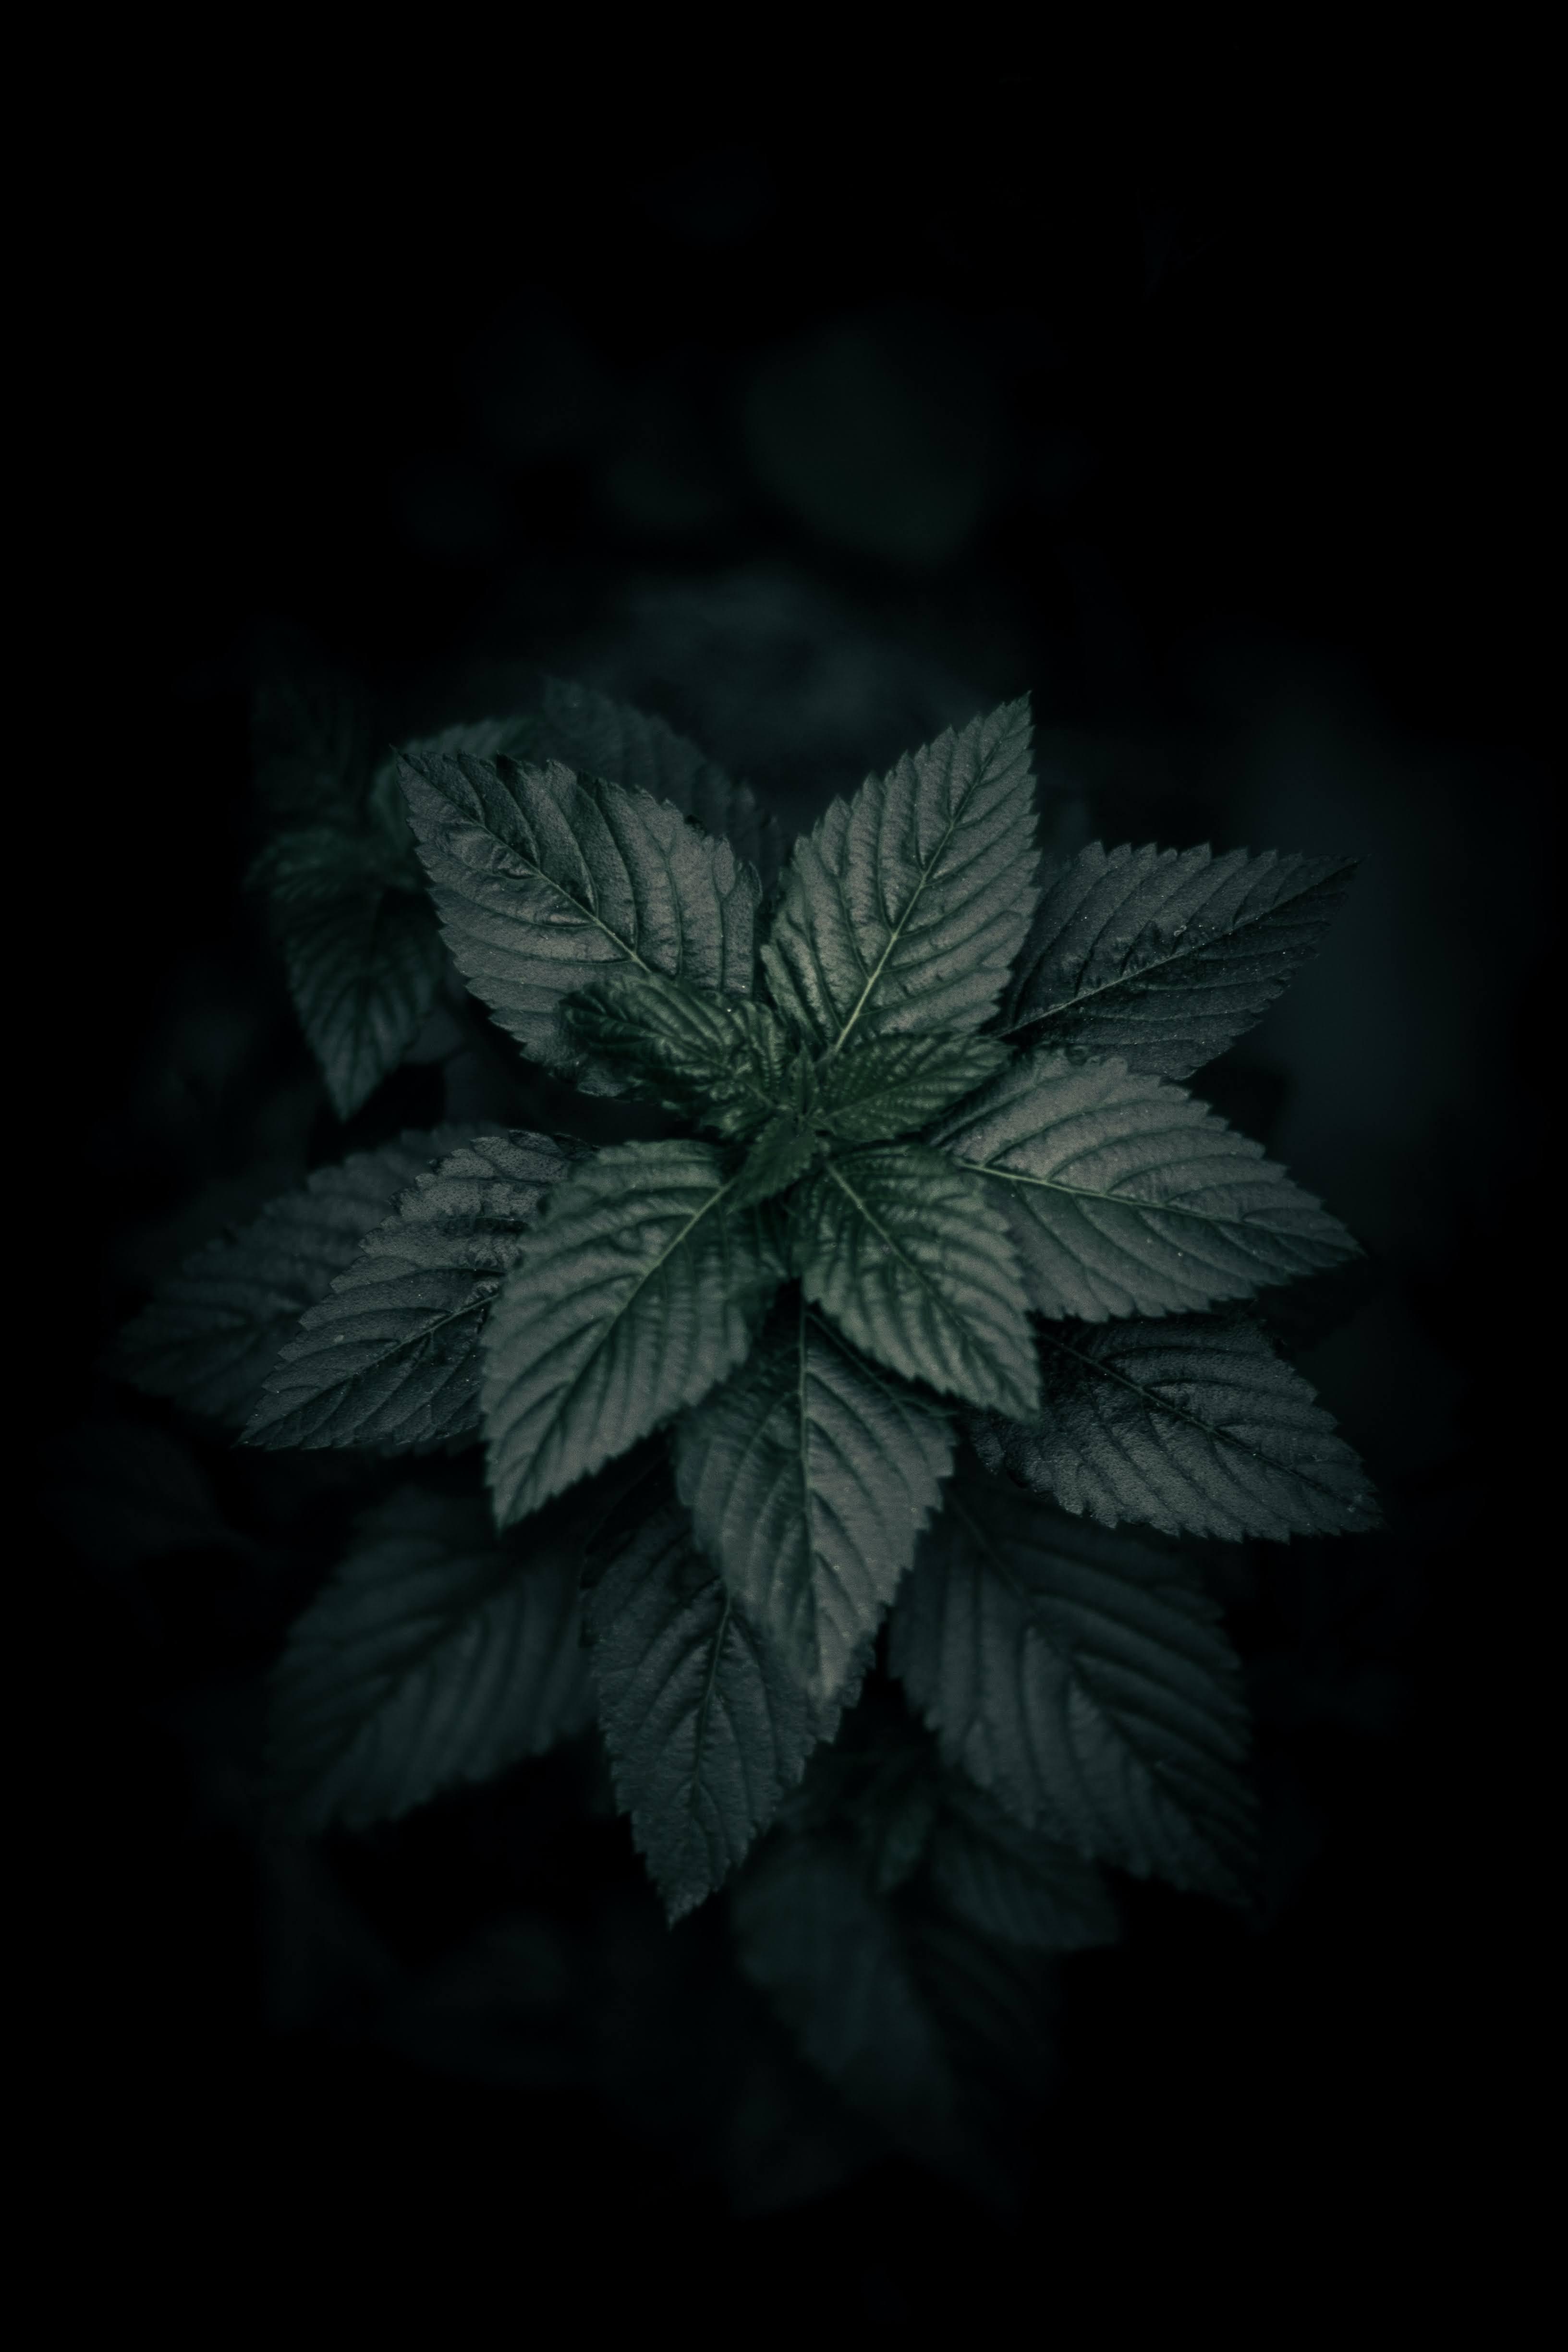 Green Plant with Black Background | Photo by Jacob Mejicanos via Unsplash